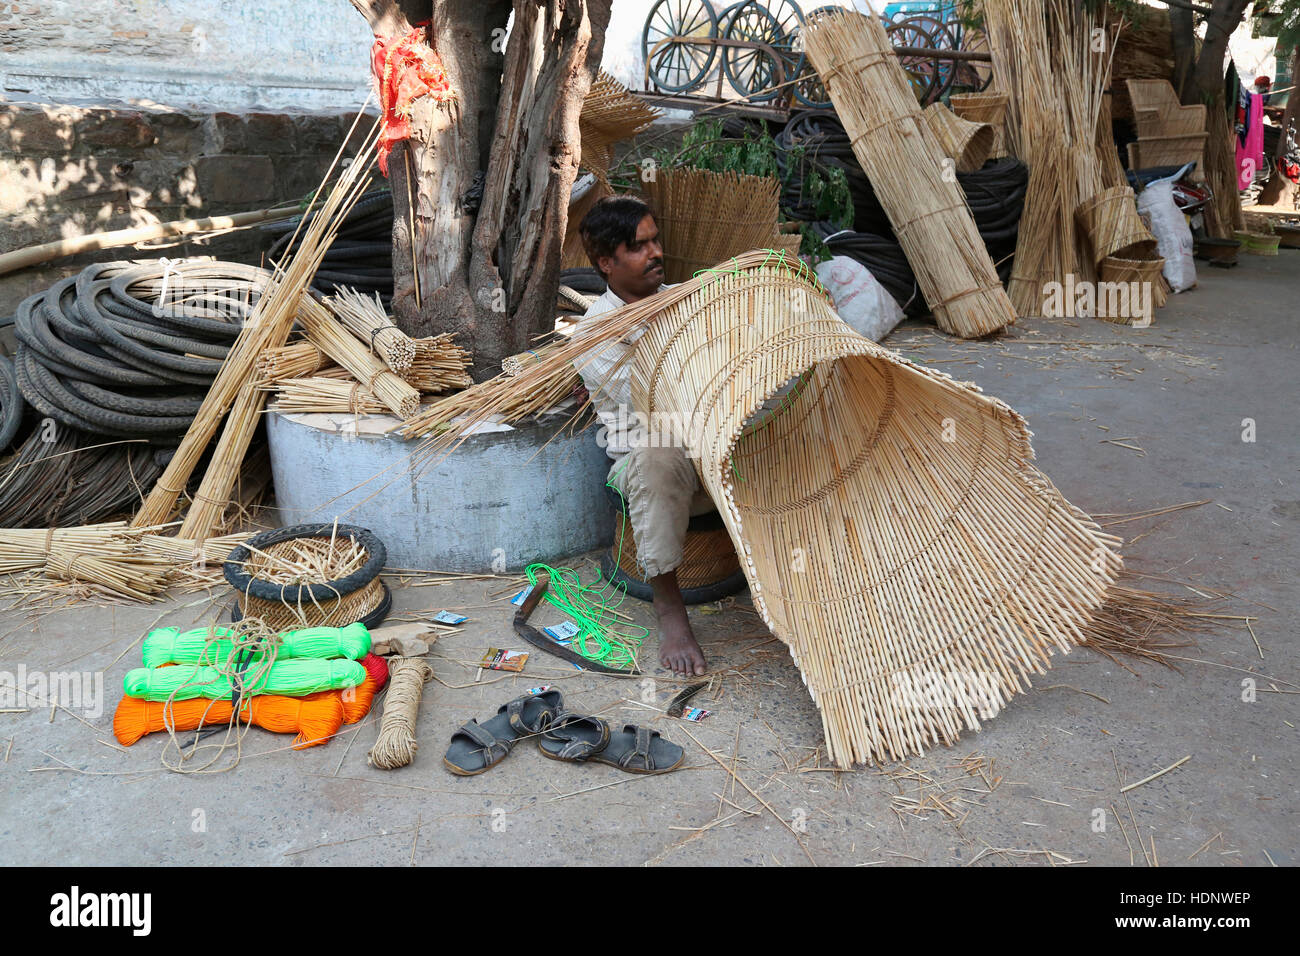 Mudda Bambou Chaise Tabouret Et D Cideurs Dans Anna Sagar Ghati Ganj